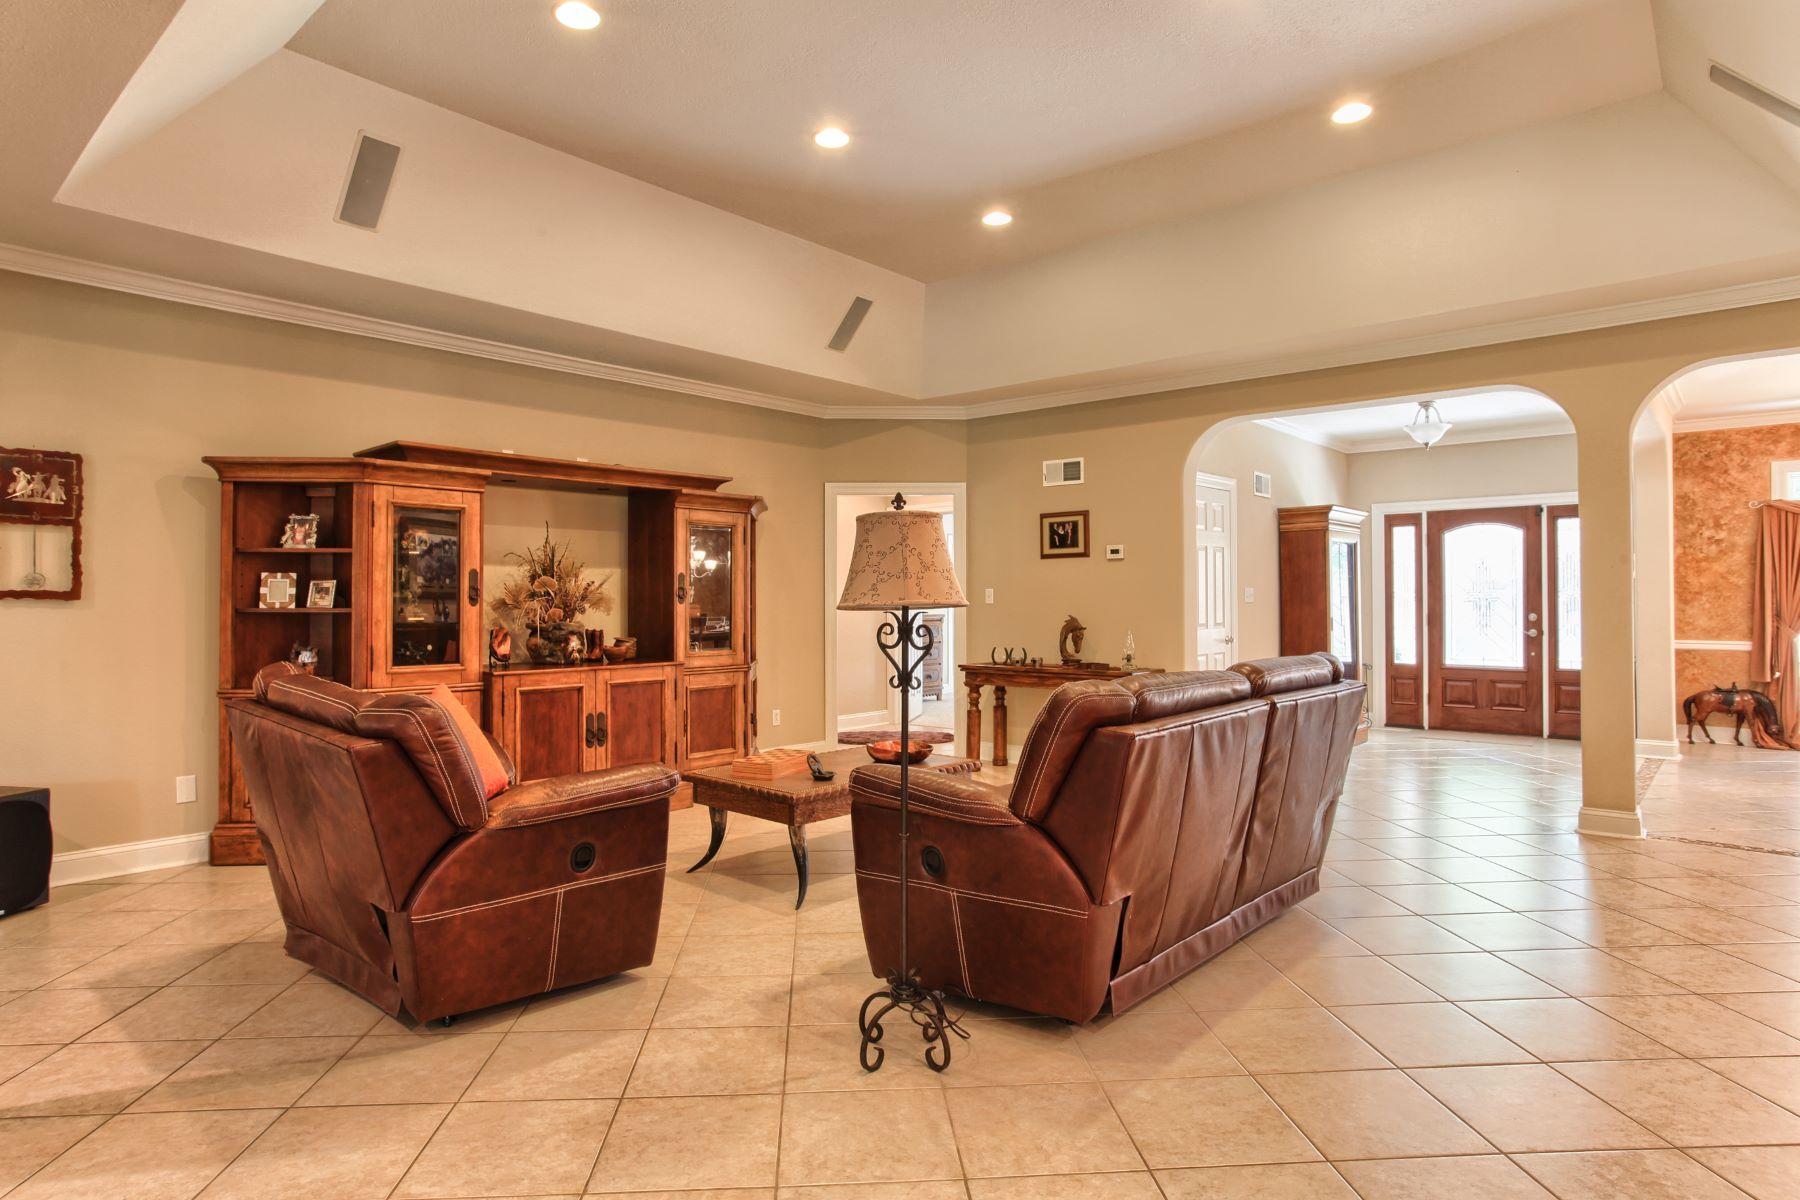 Additional photo for property listing at 0 Patrick Road  Palmyra, Pennsylvania 17078 Estados Unidos